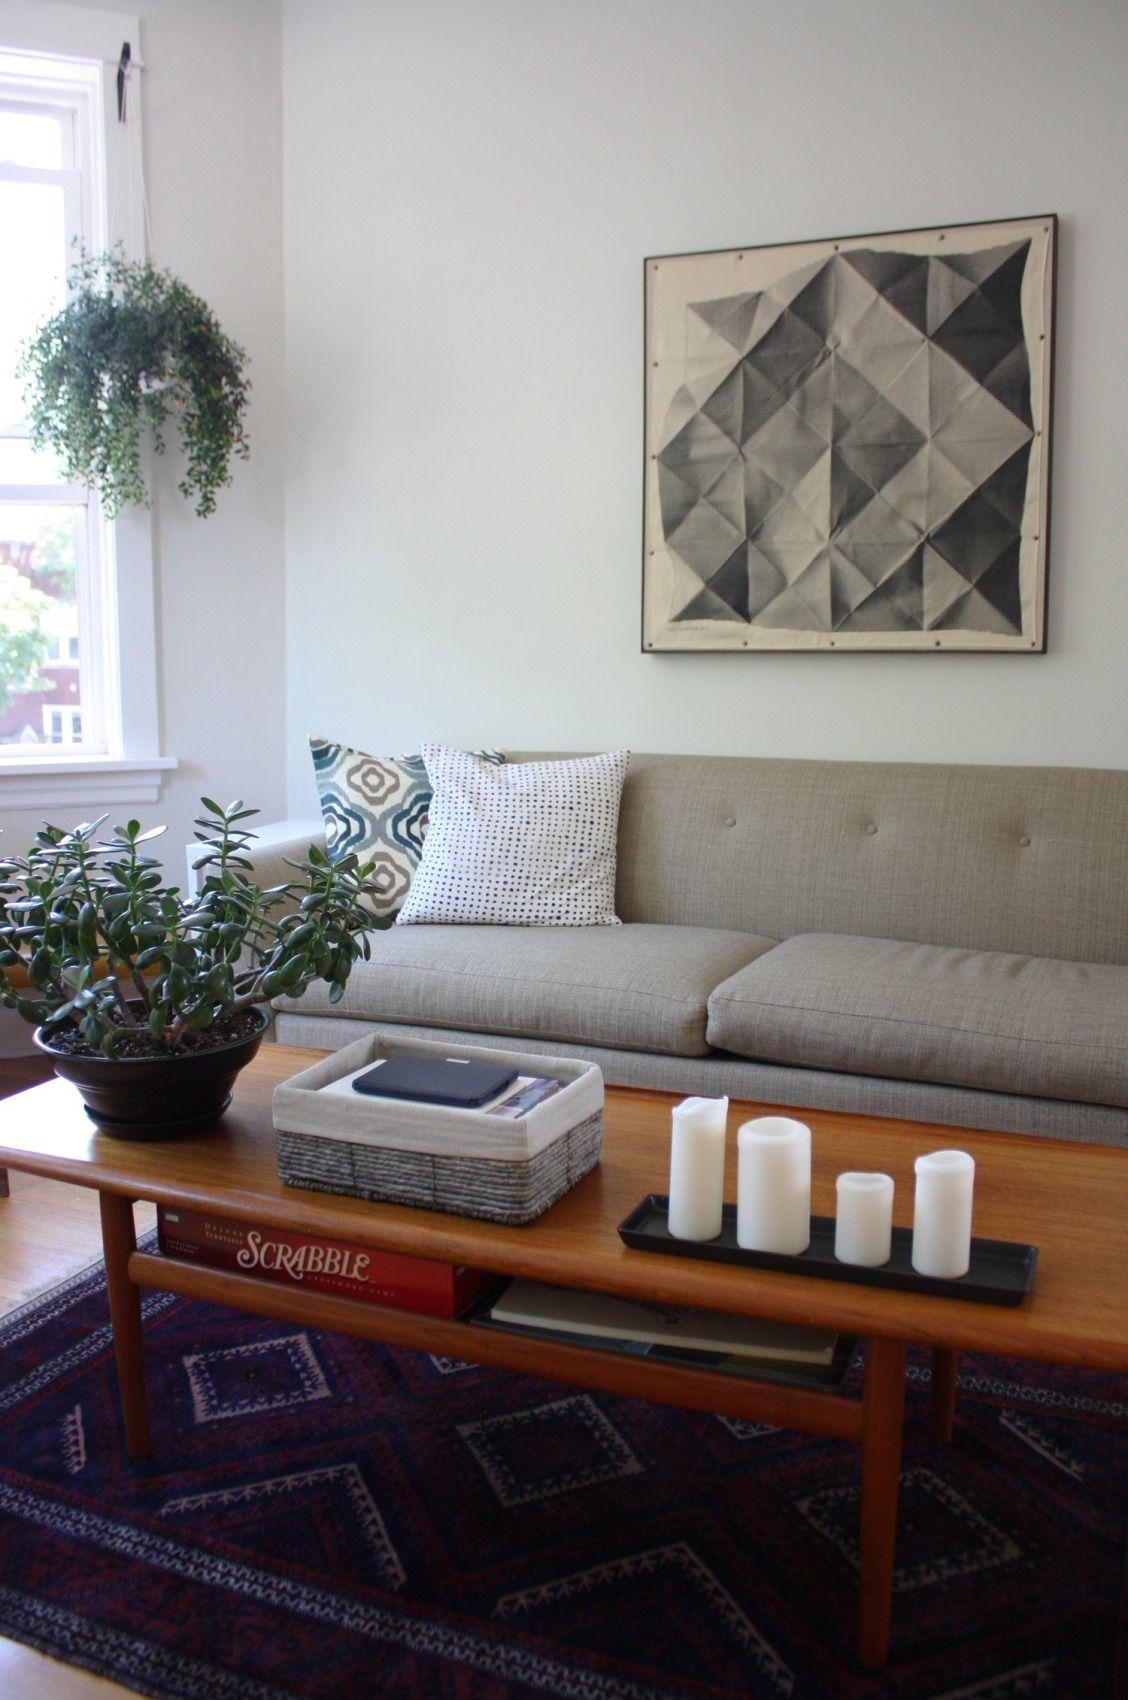 Interior Design Cost For Living Room Mesmerizing Cheap Yet Chic Low Cost Living Room Design Ideas  Chic Living Design Inspiration